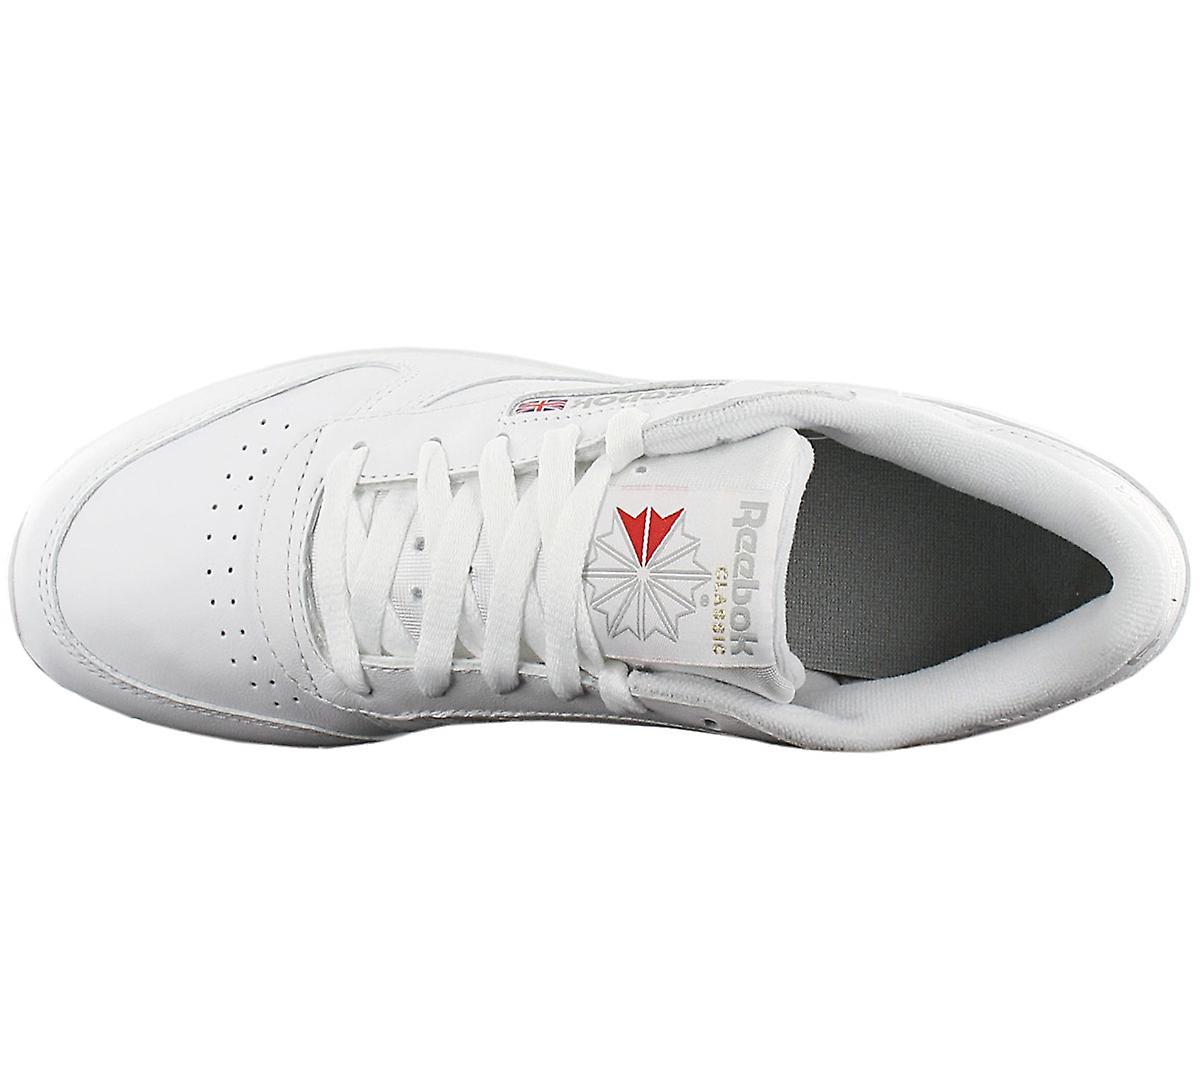 Reebok Classic Leather CL LTHR - Damen Schuhe Weiß 2232 Sneakers Sportschuhe FEQrO